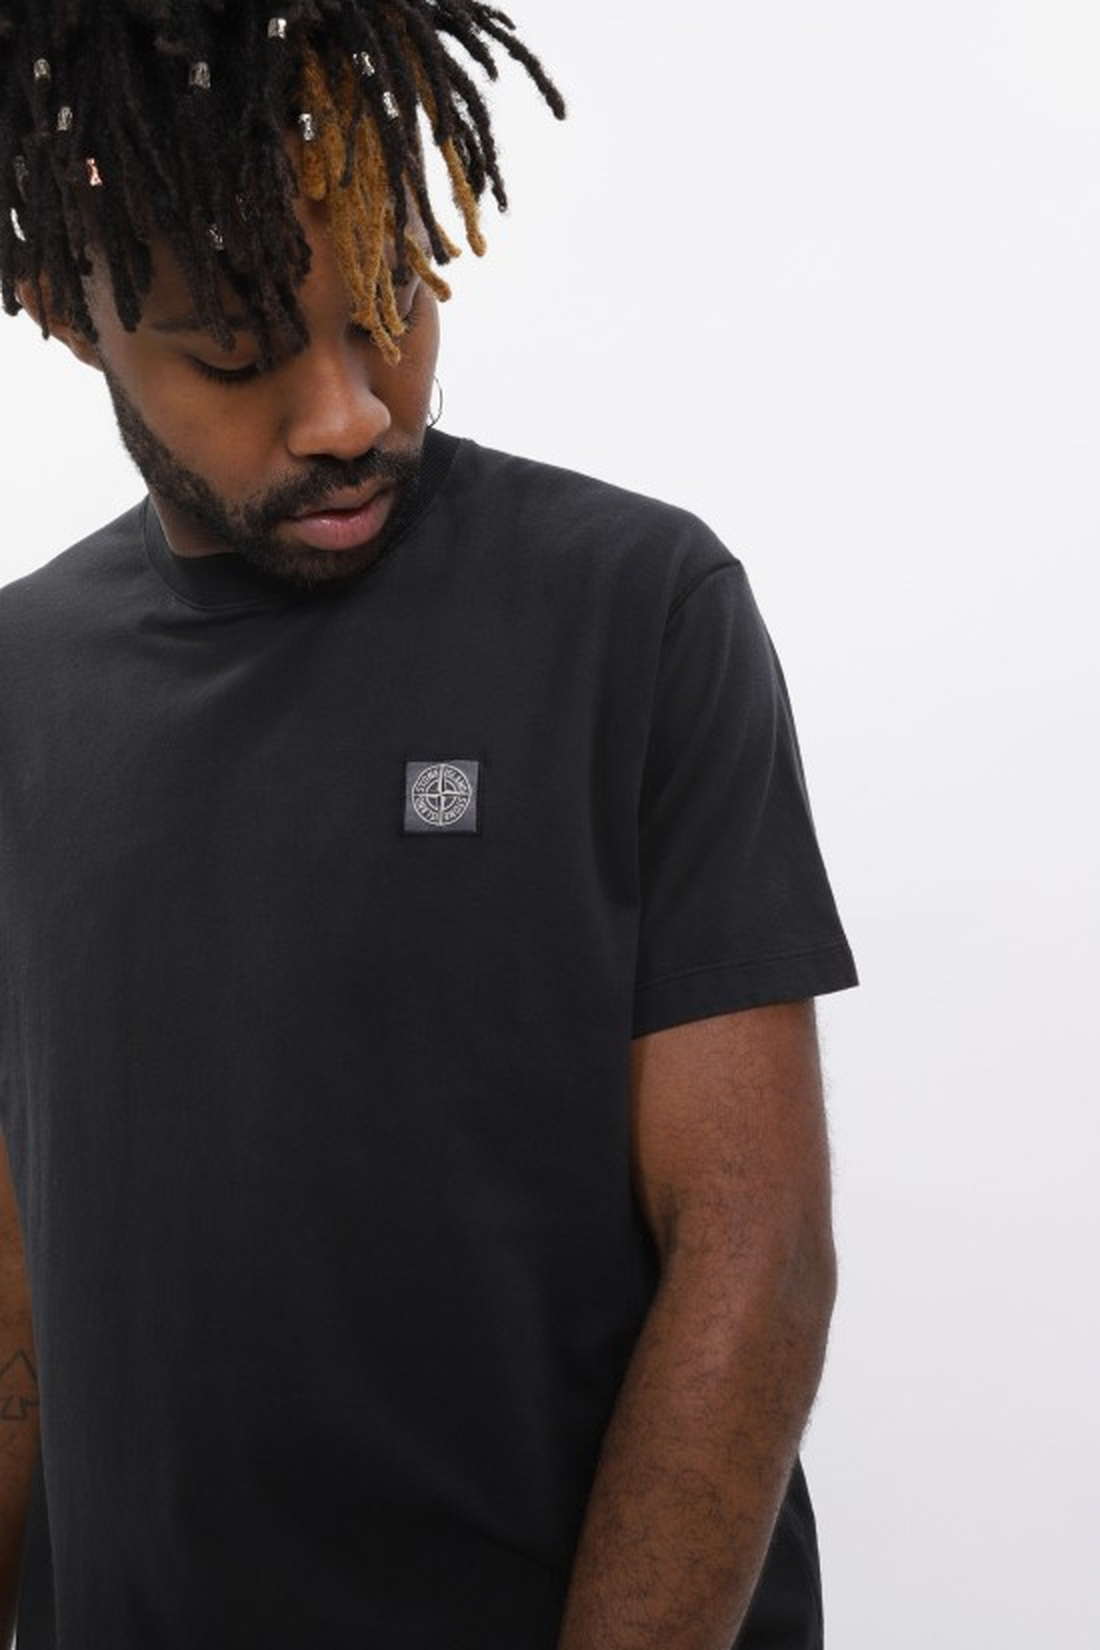 STONE ISLAND / 21657 t shirt v0029 Nero